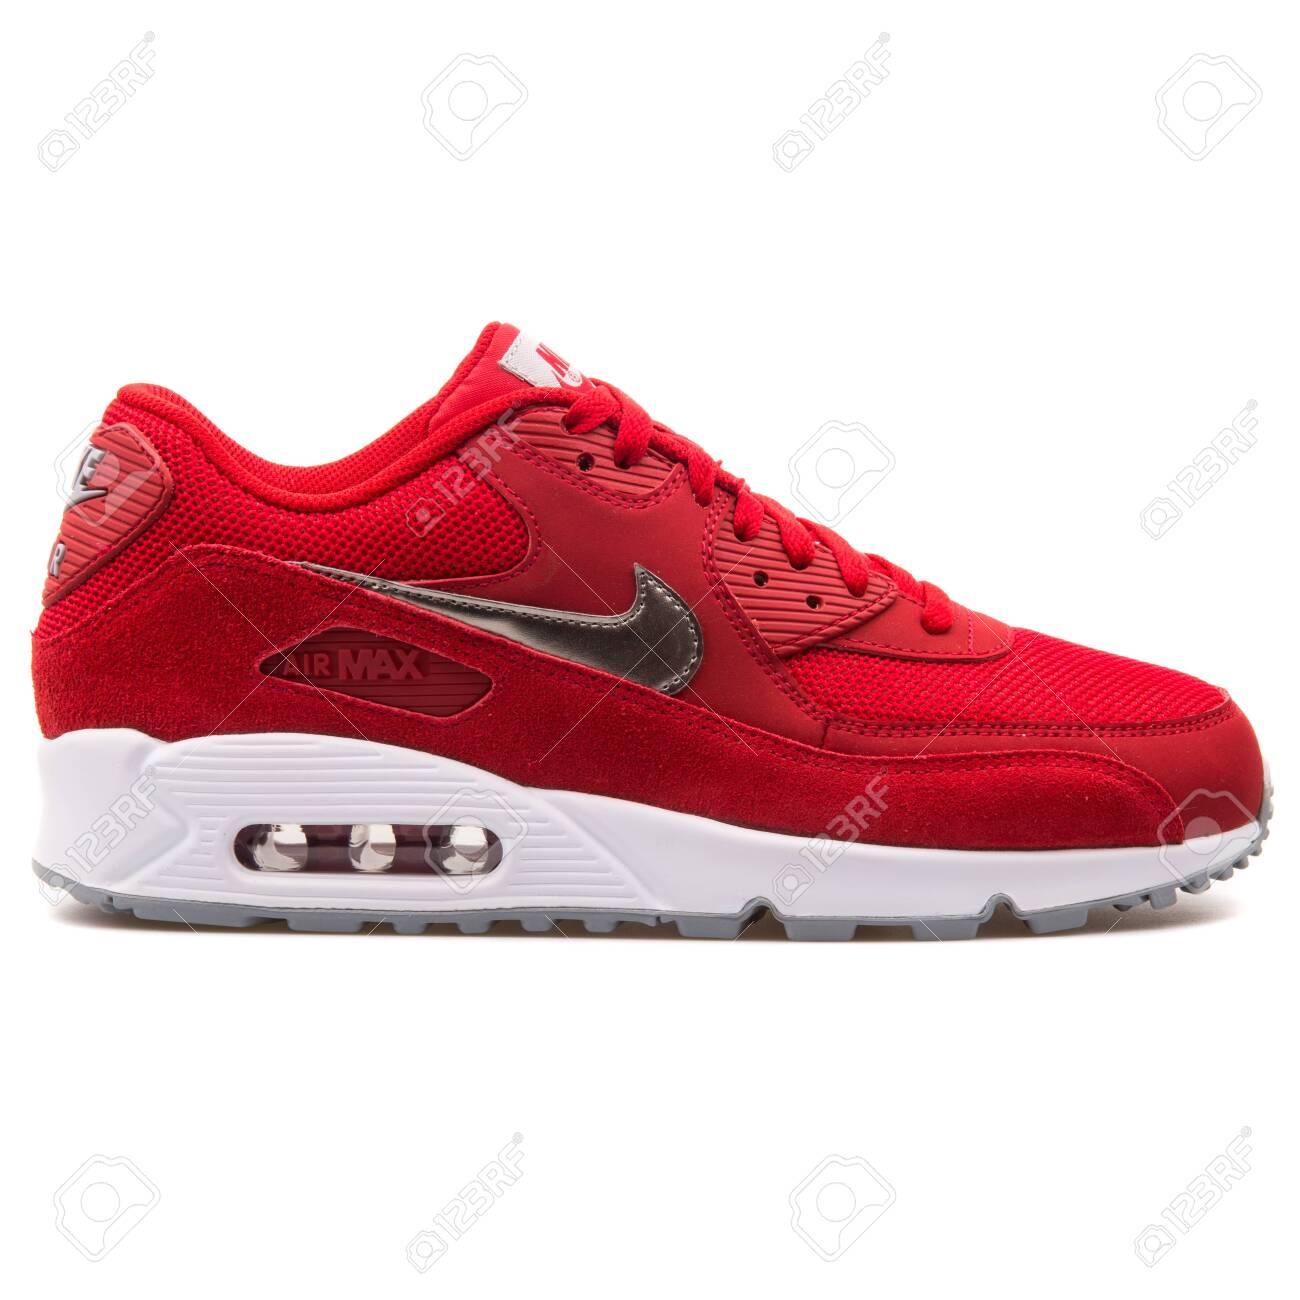 2017 Neu Shop Nike Air Max 90 Essential Schuhe Turnschuhe